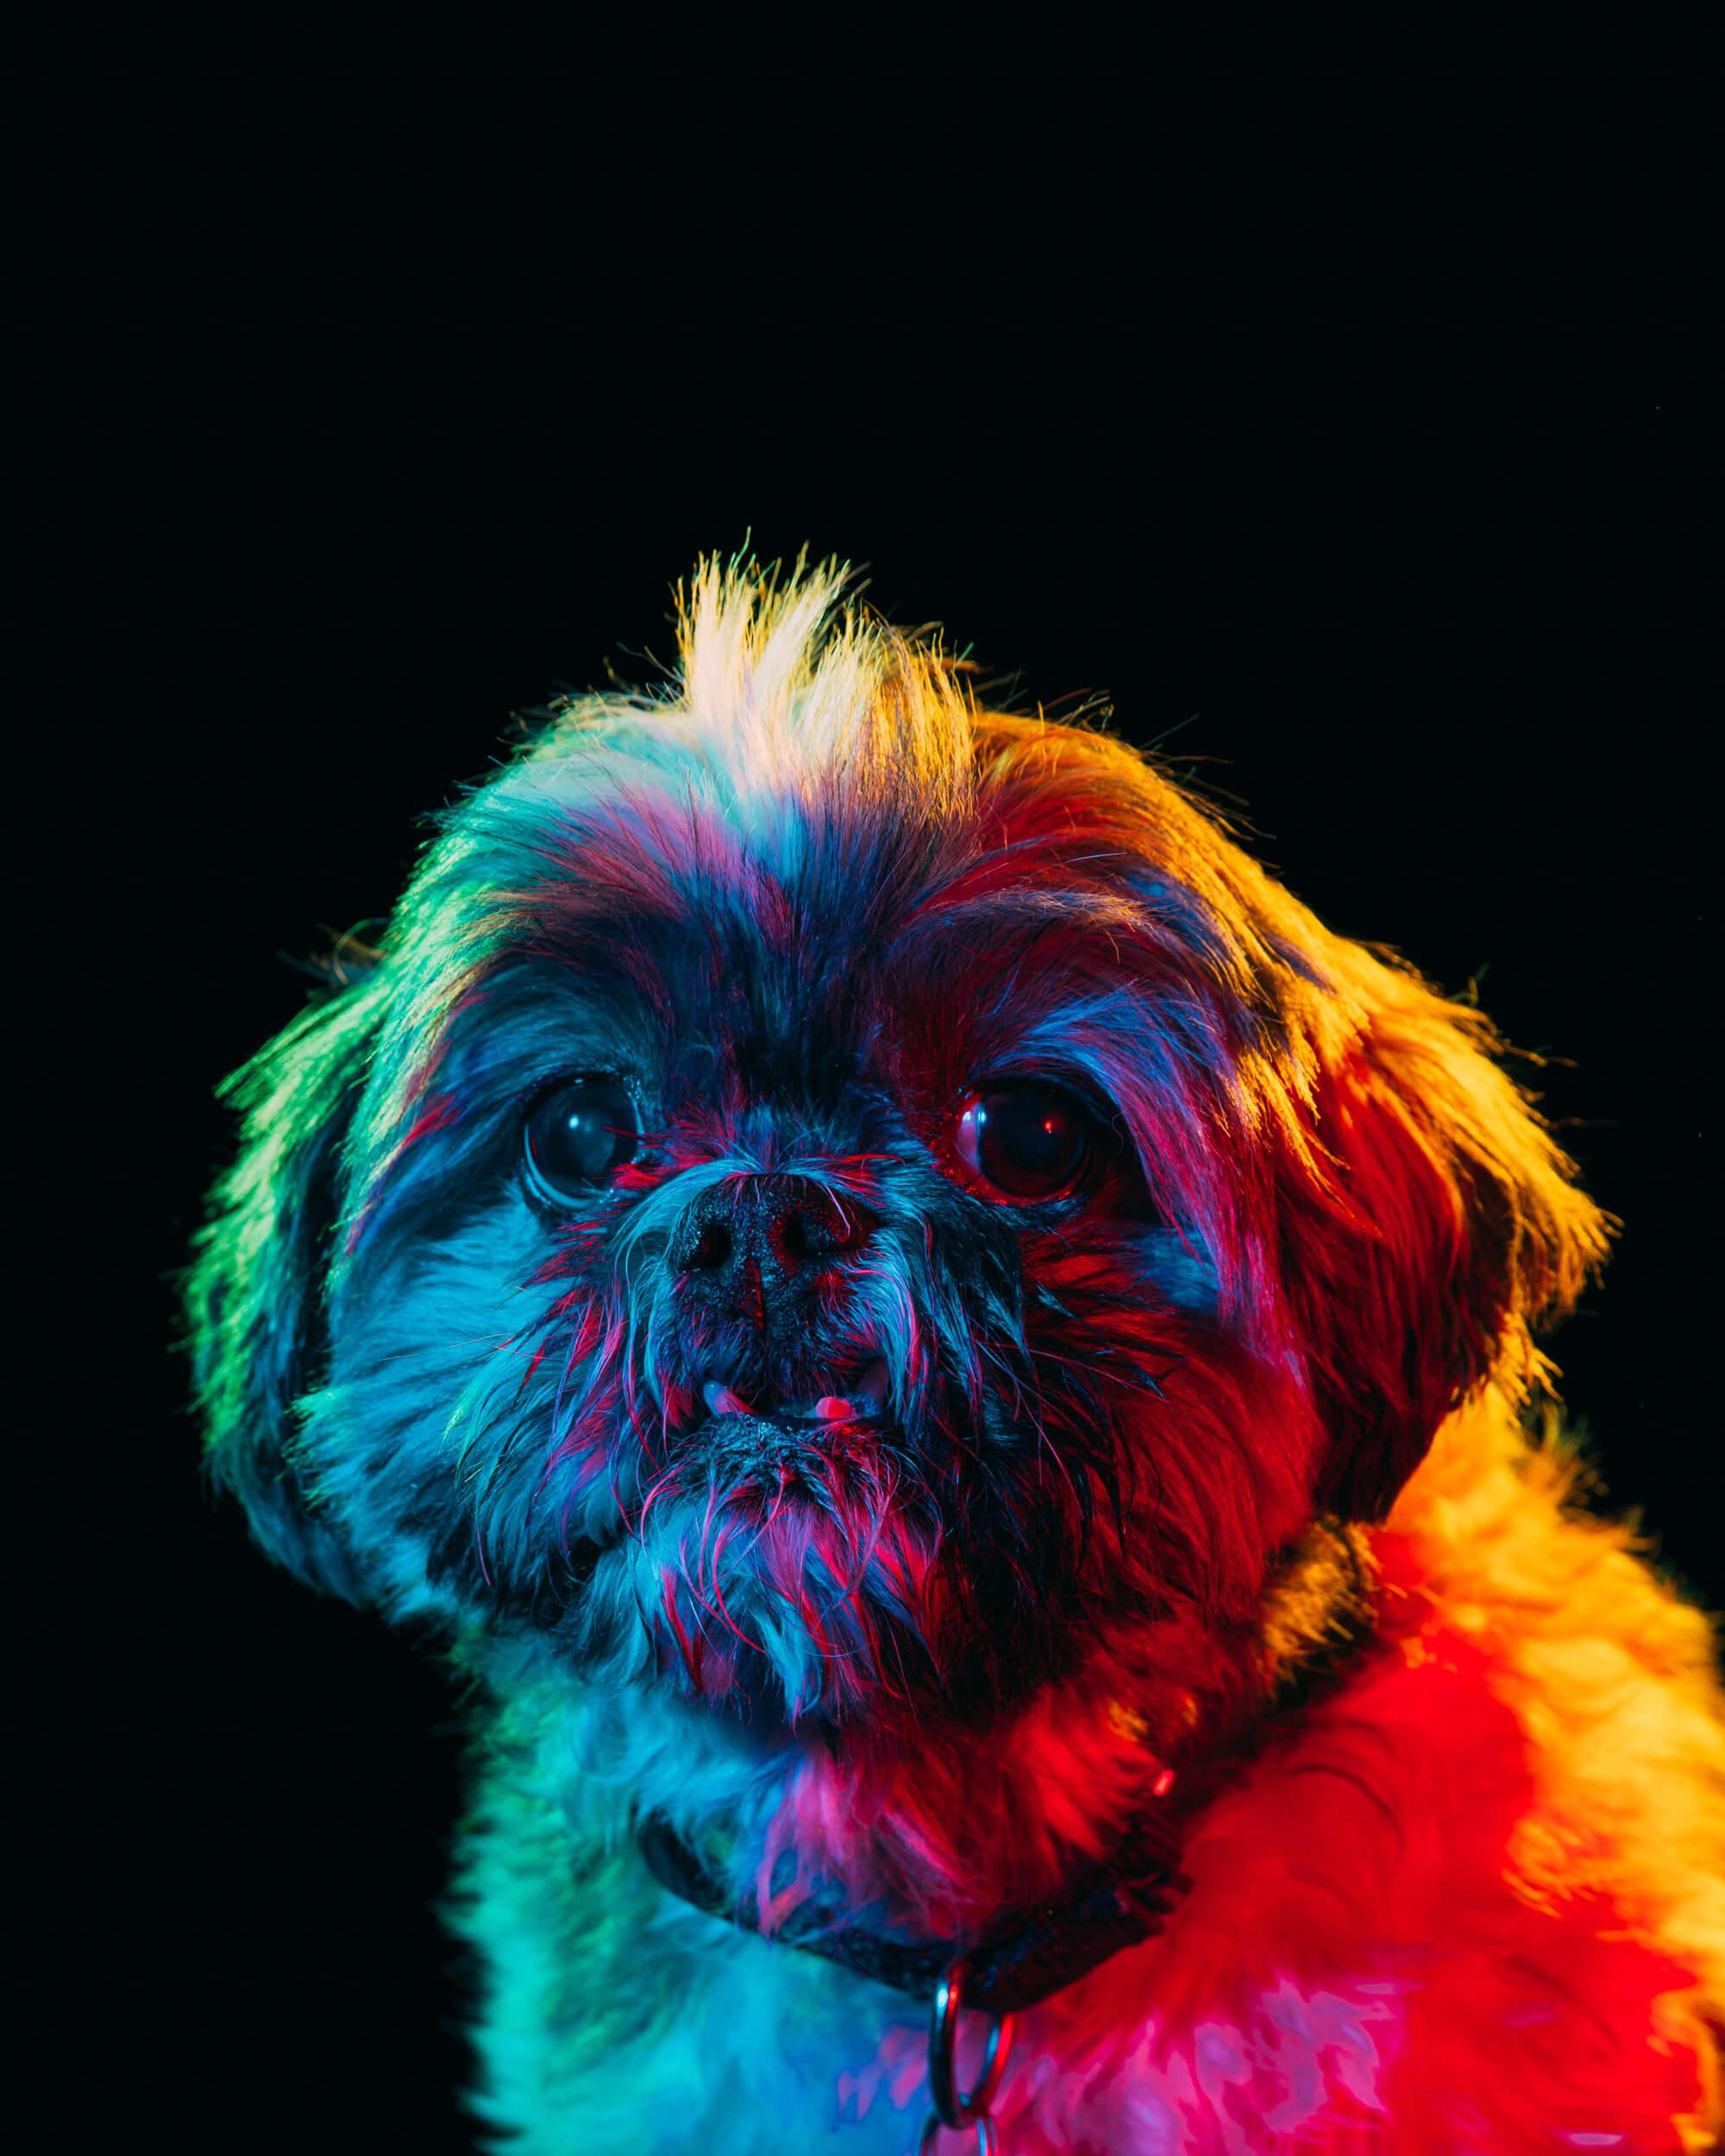 Paul Octavious adoptable dogs portraits 3 (1)